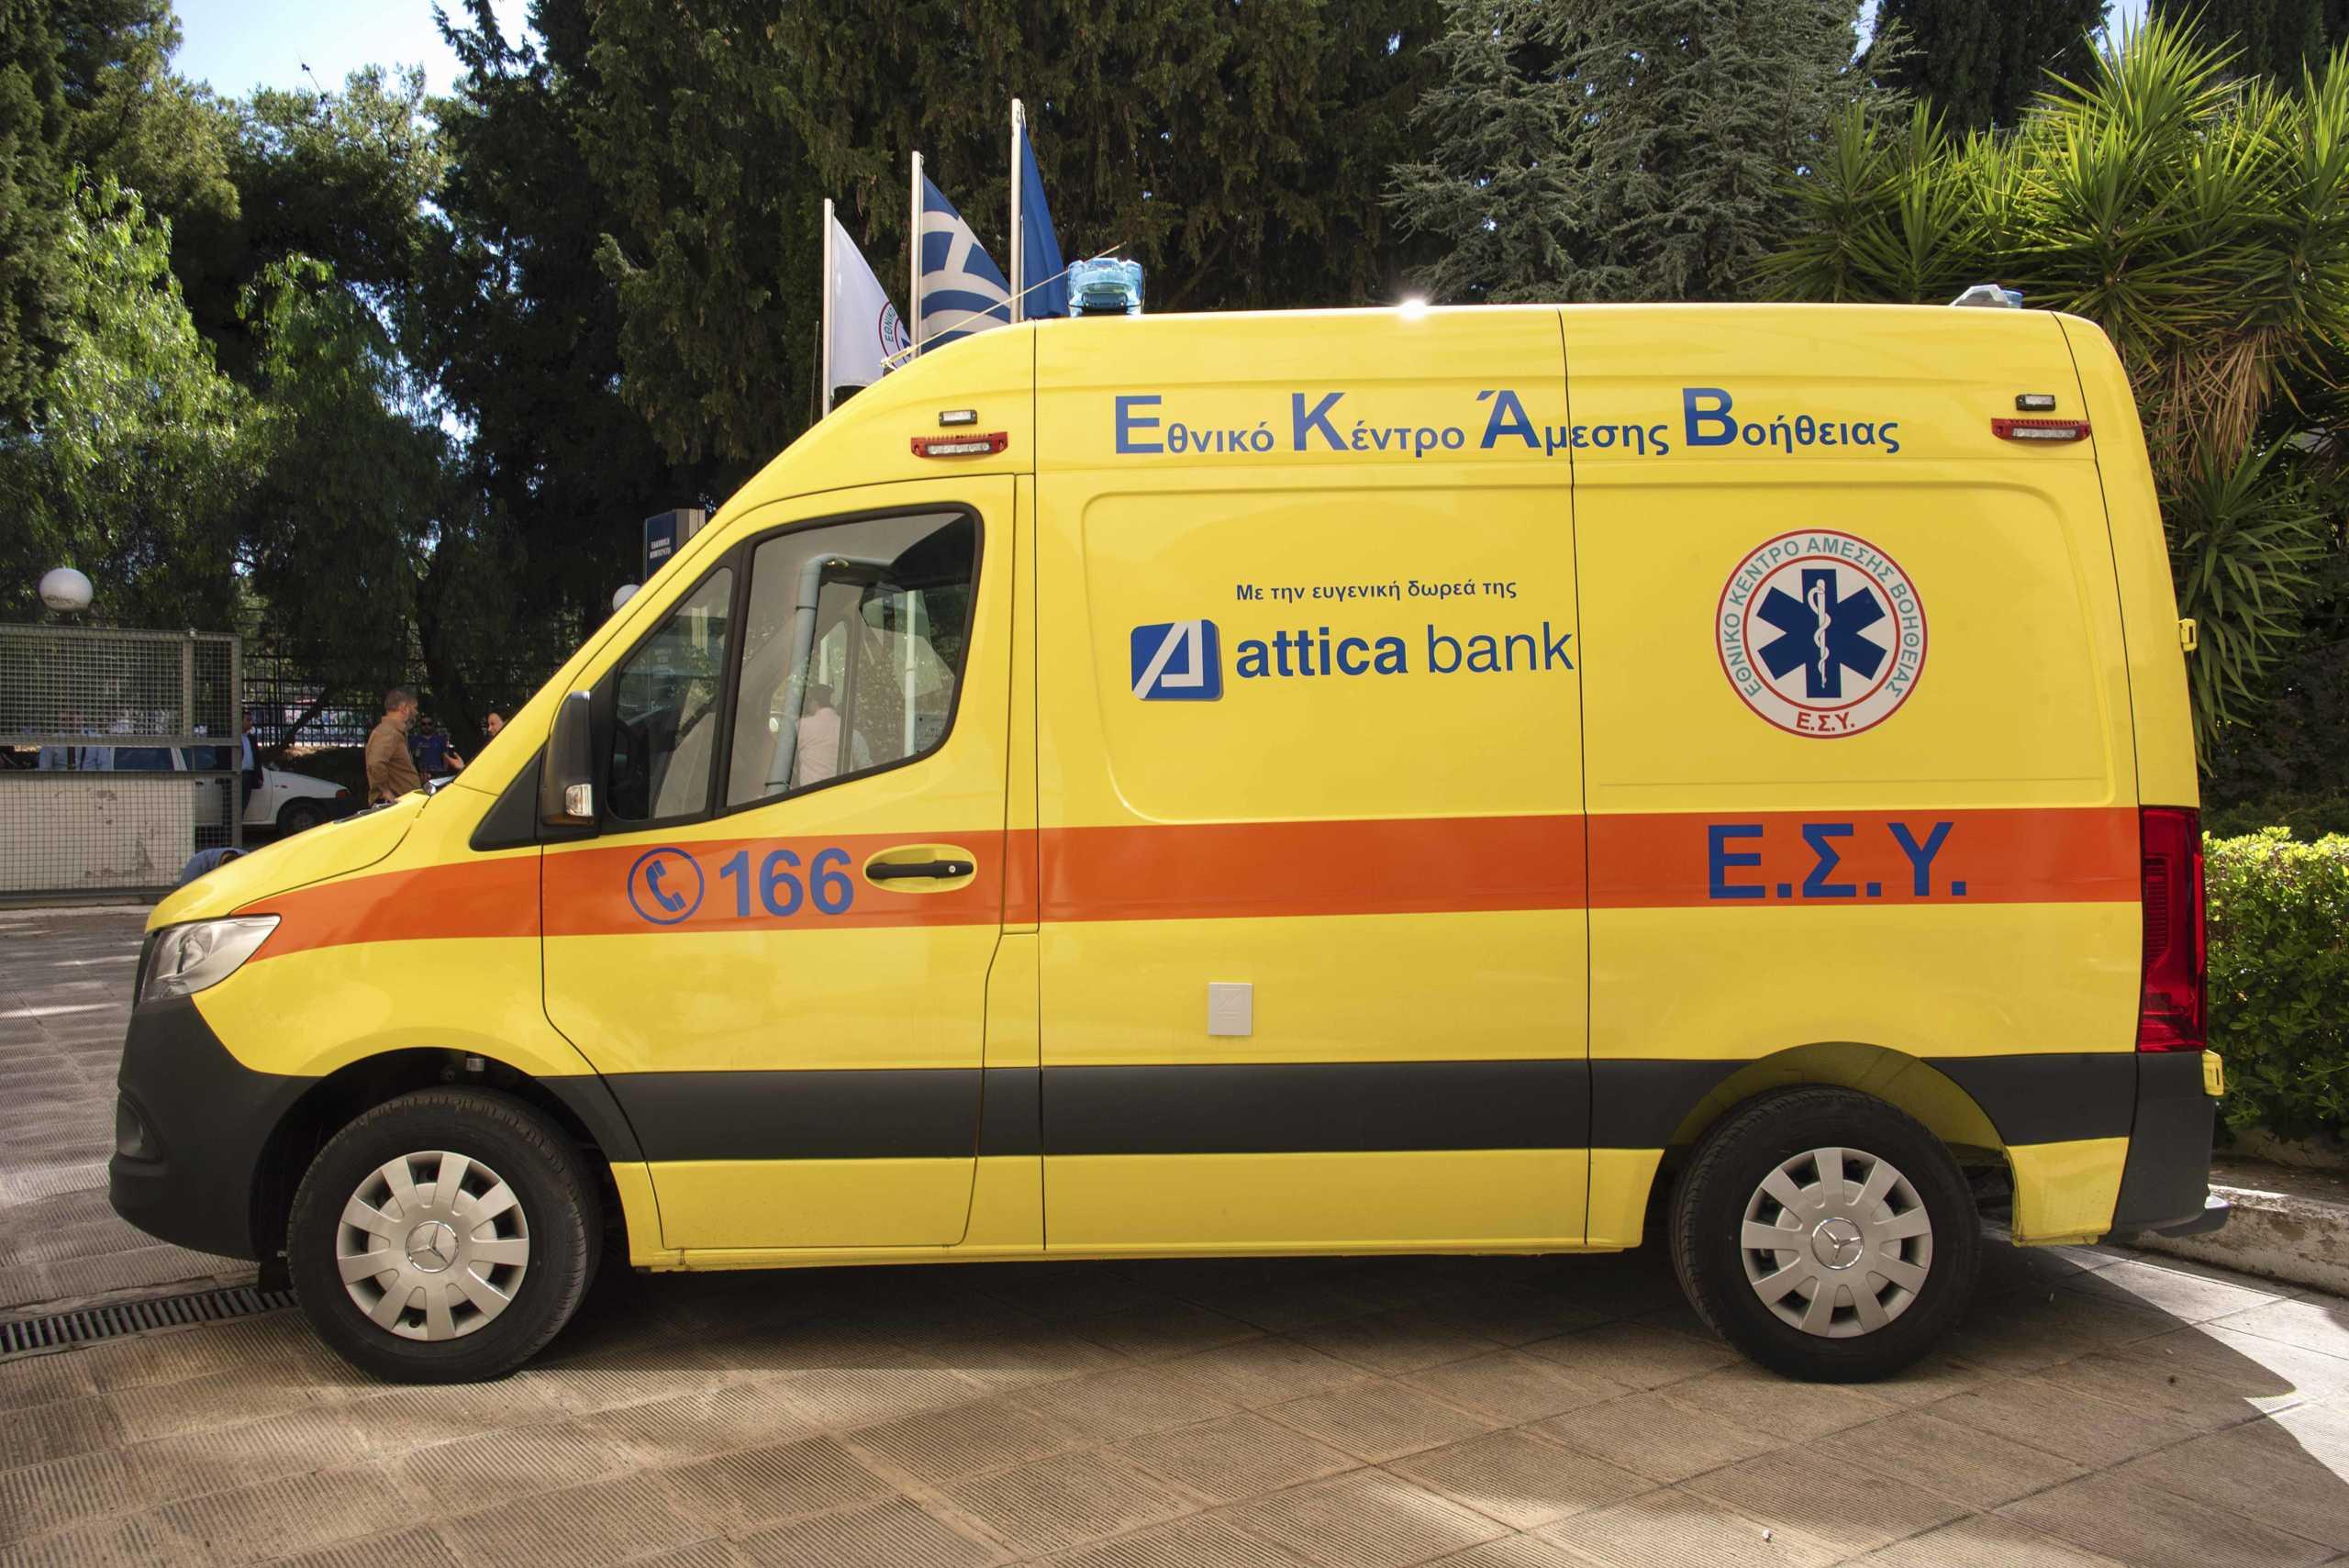 Attica Bank: Ευθύνη όλων η στήριξη του ΕΣΥ – Δωρεά στο ΕΚΑΒ ένα ασθενοφόρο